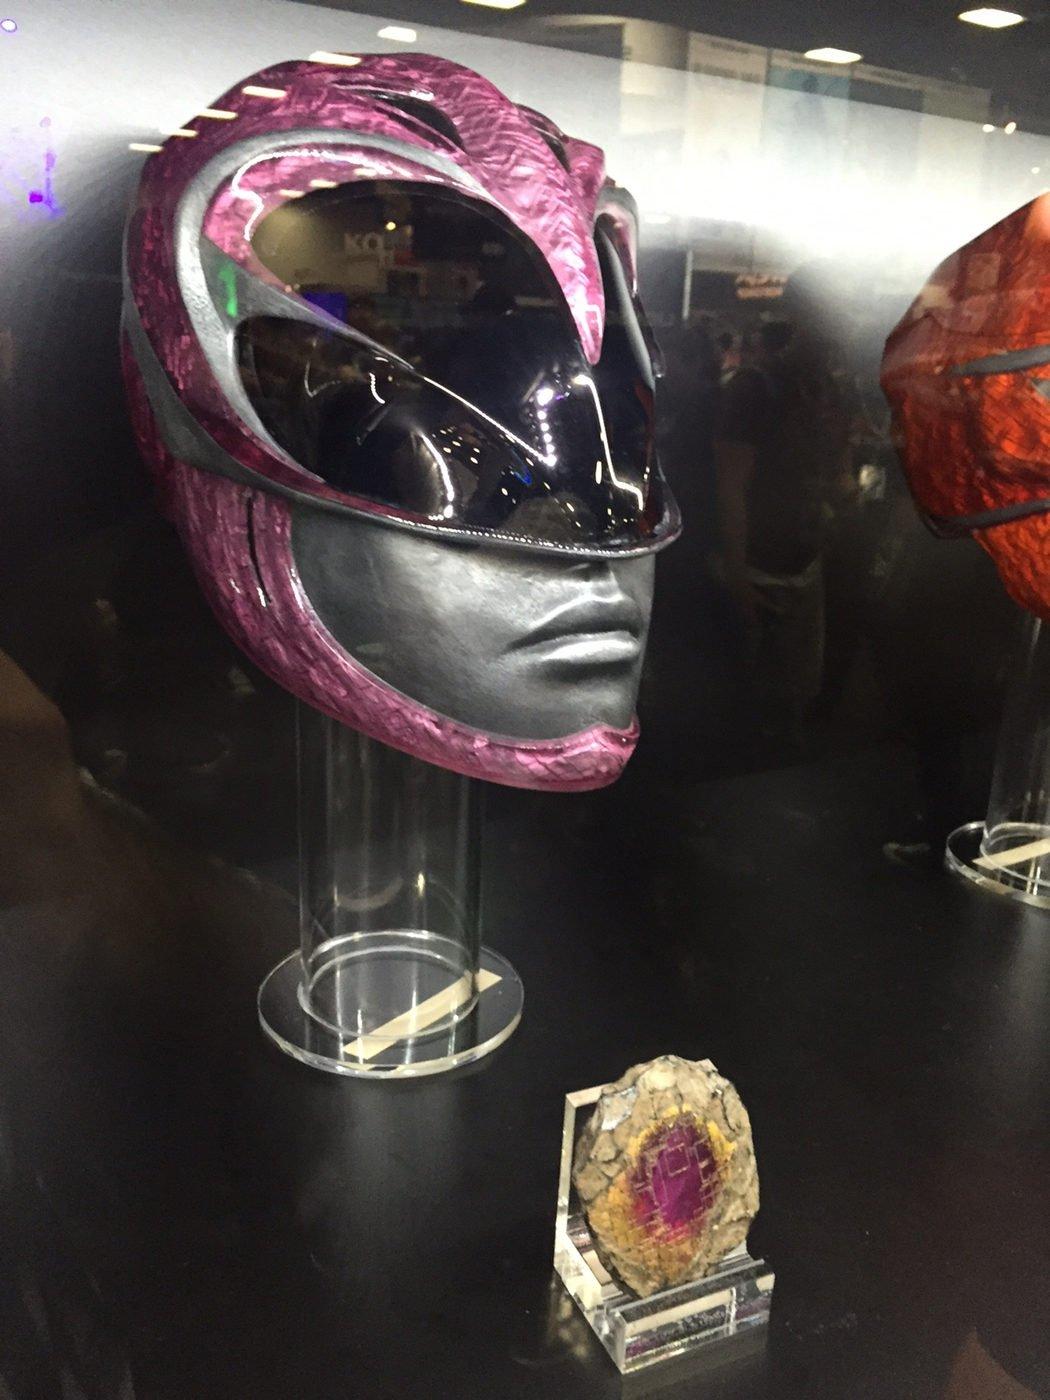 Casco y moneda de poder del ranger rosa